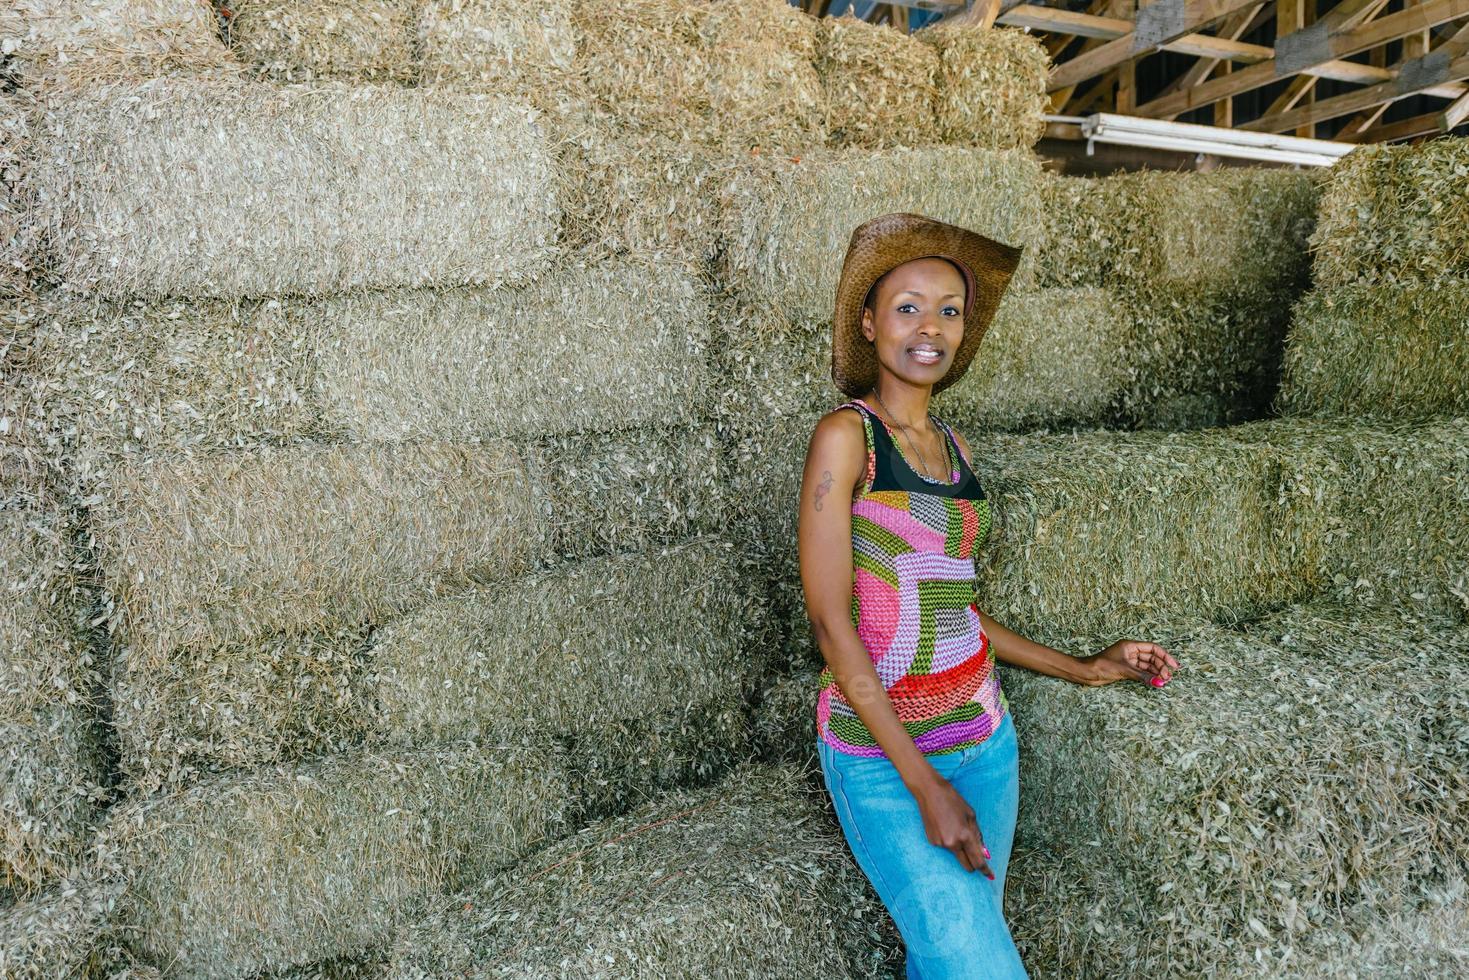 boerderij vrouw foto